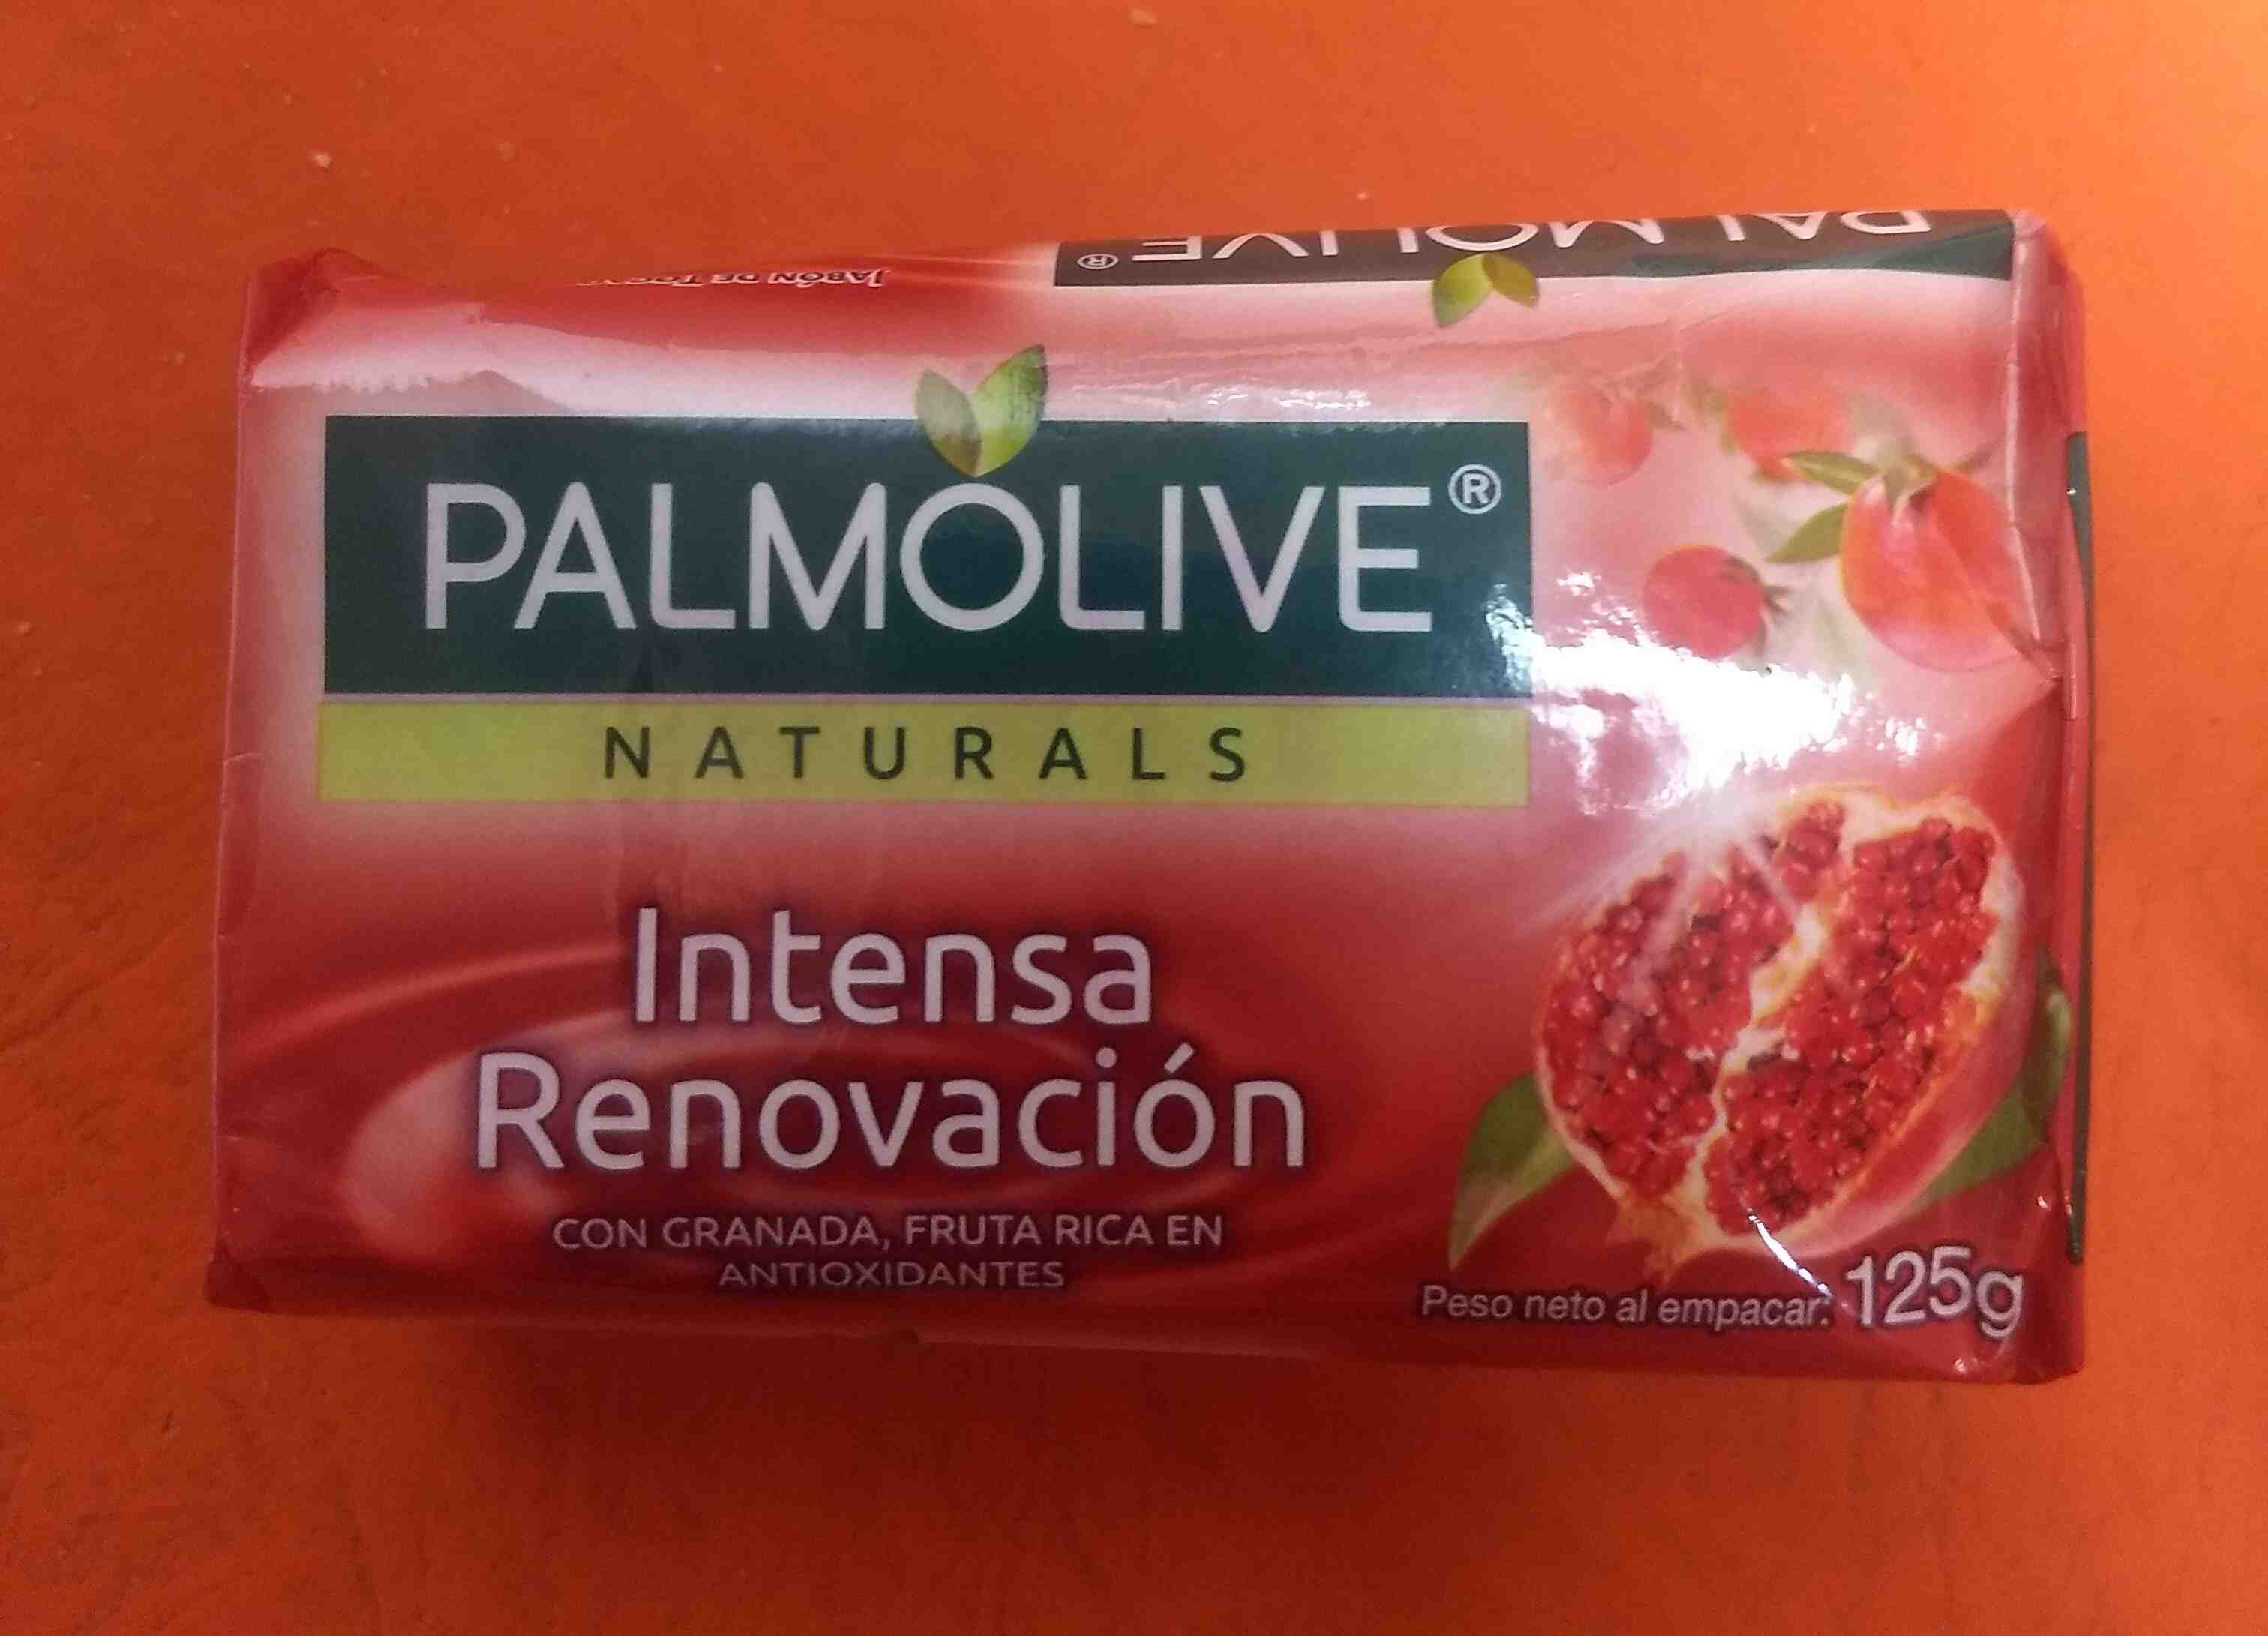 Naturals intensa renovación con granada - Produit - en